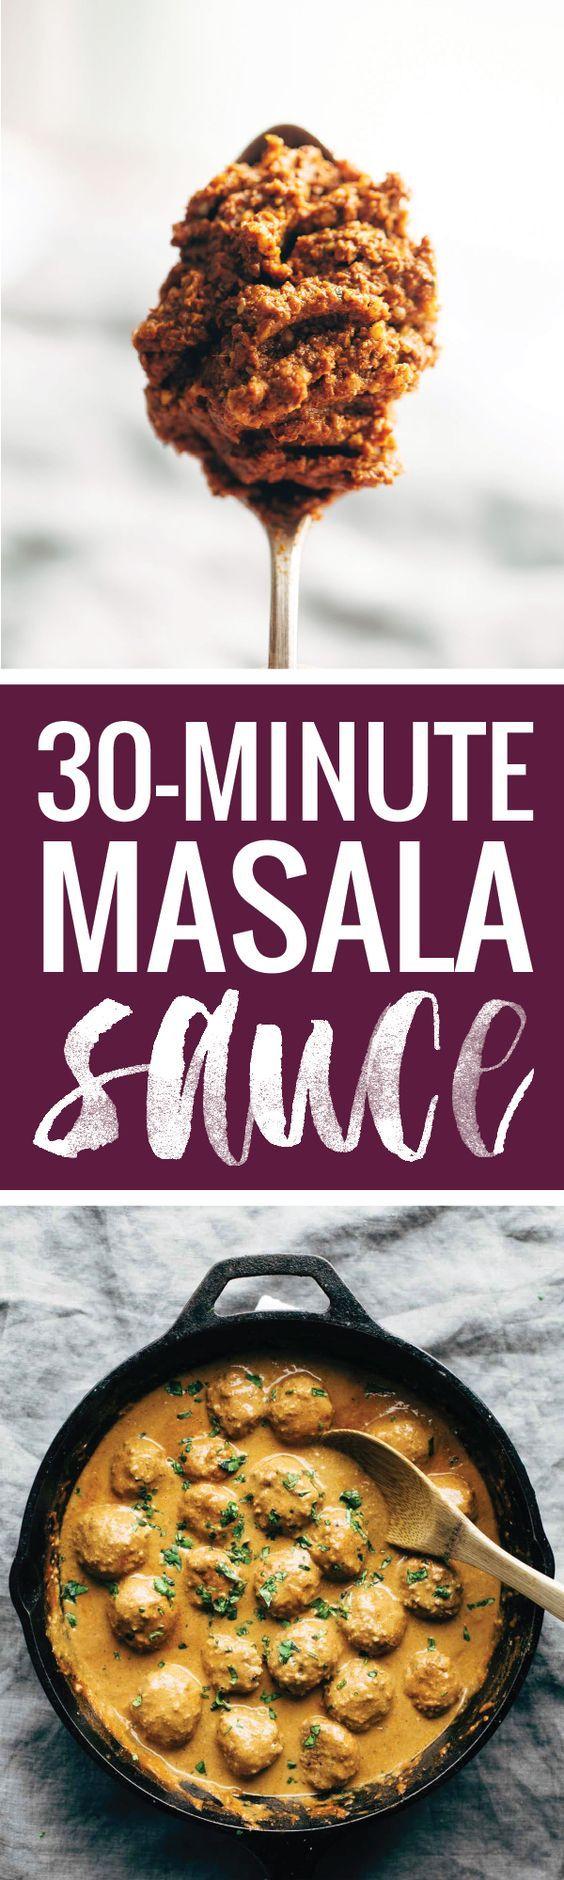 30 Minute Masala Sauce! made with onions, garlic, turmeric, cumin, chili powder, lemon juice, cilantro, tomato puree, and coconut milk. Perfect sauce for veggie / chicken tikka masala, or meatballs! Vegetarian / Vegan.  pinchofyum.com